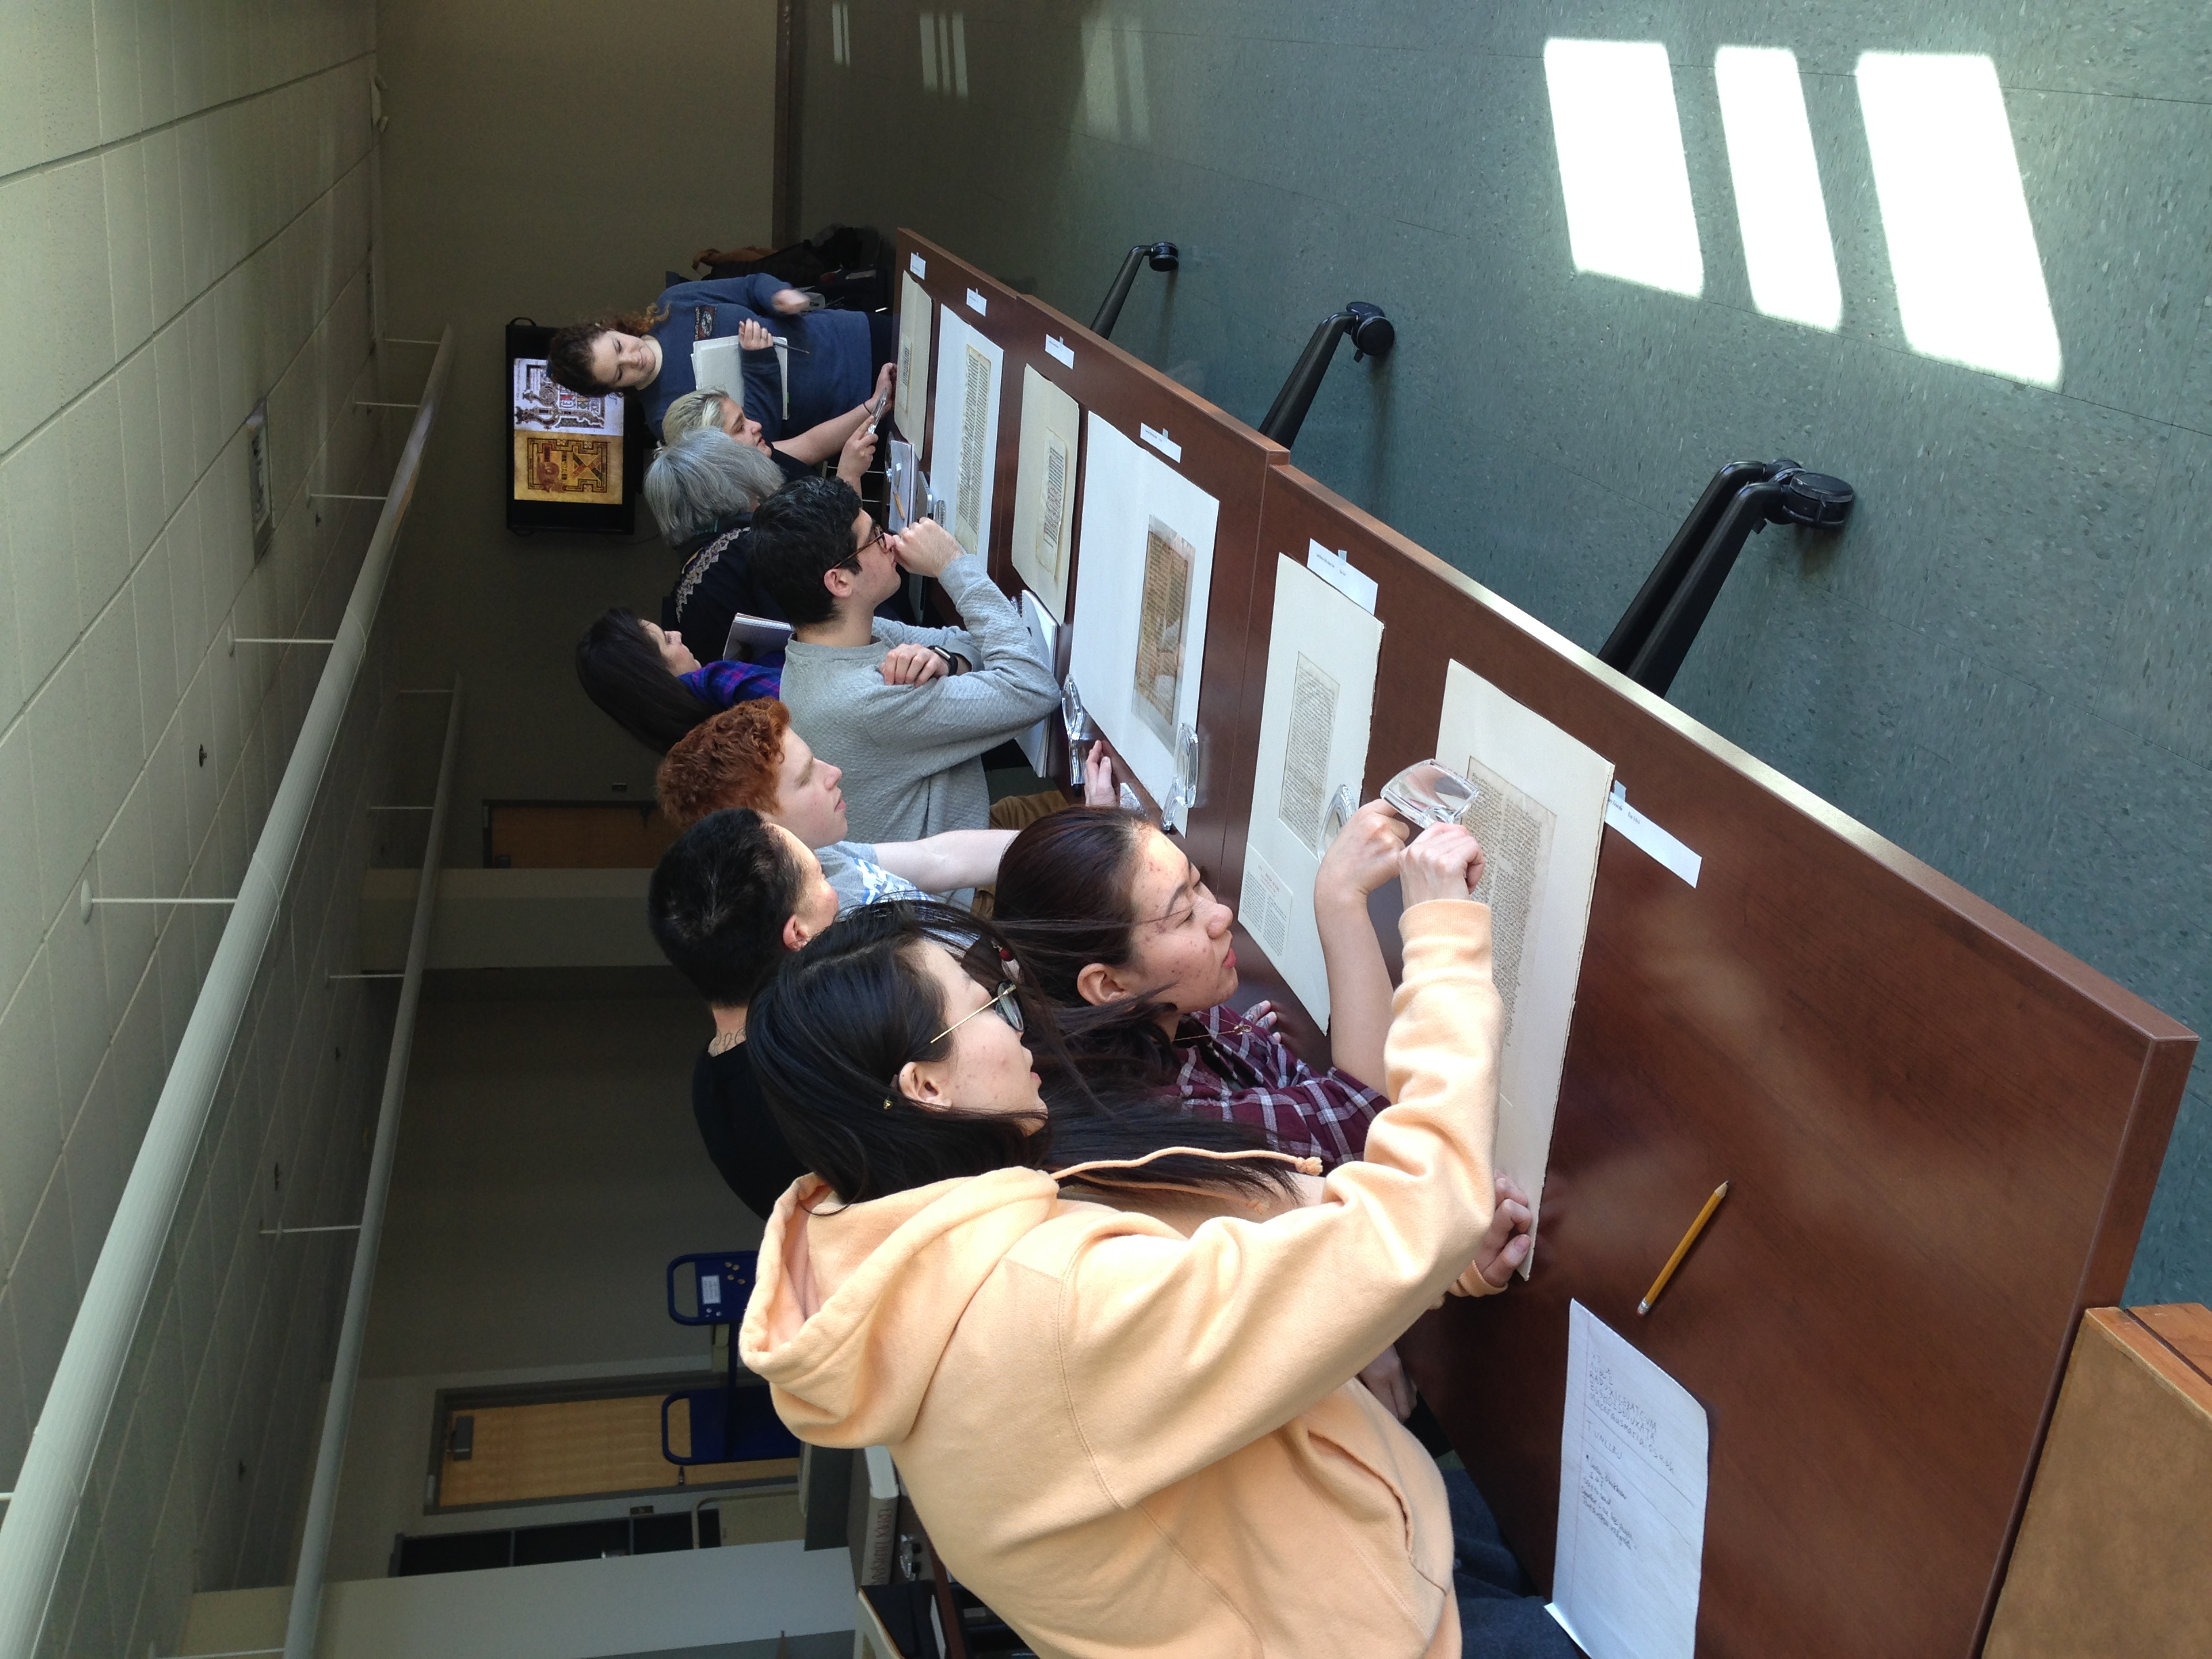 Students study medieval manuscript fragments